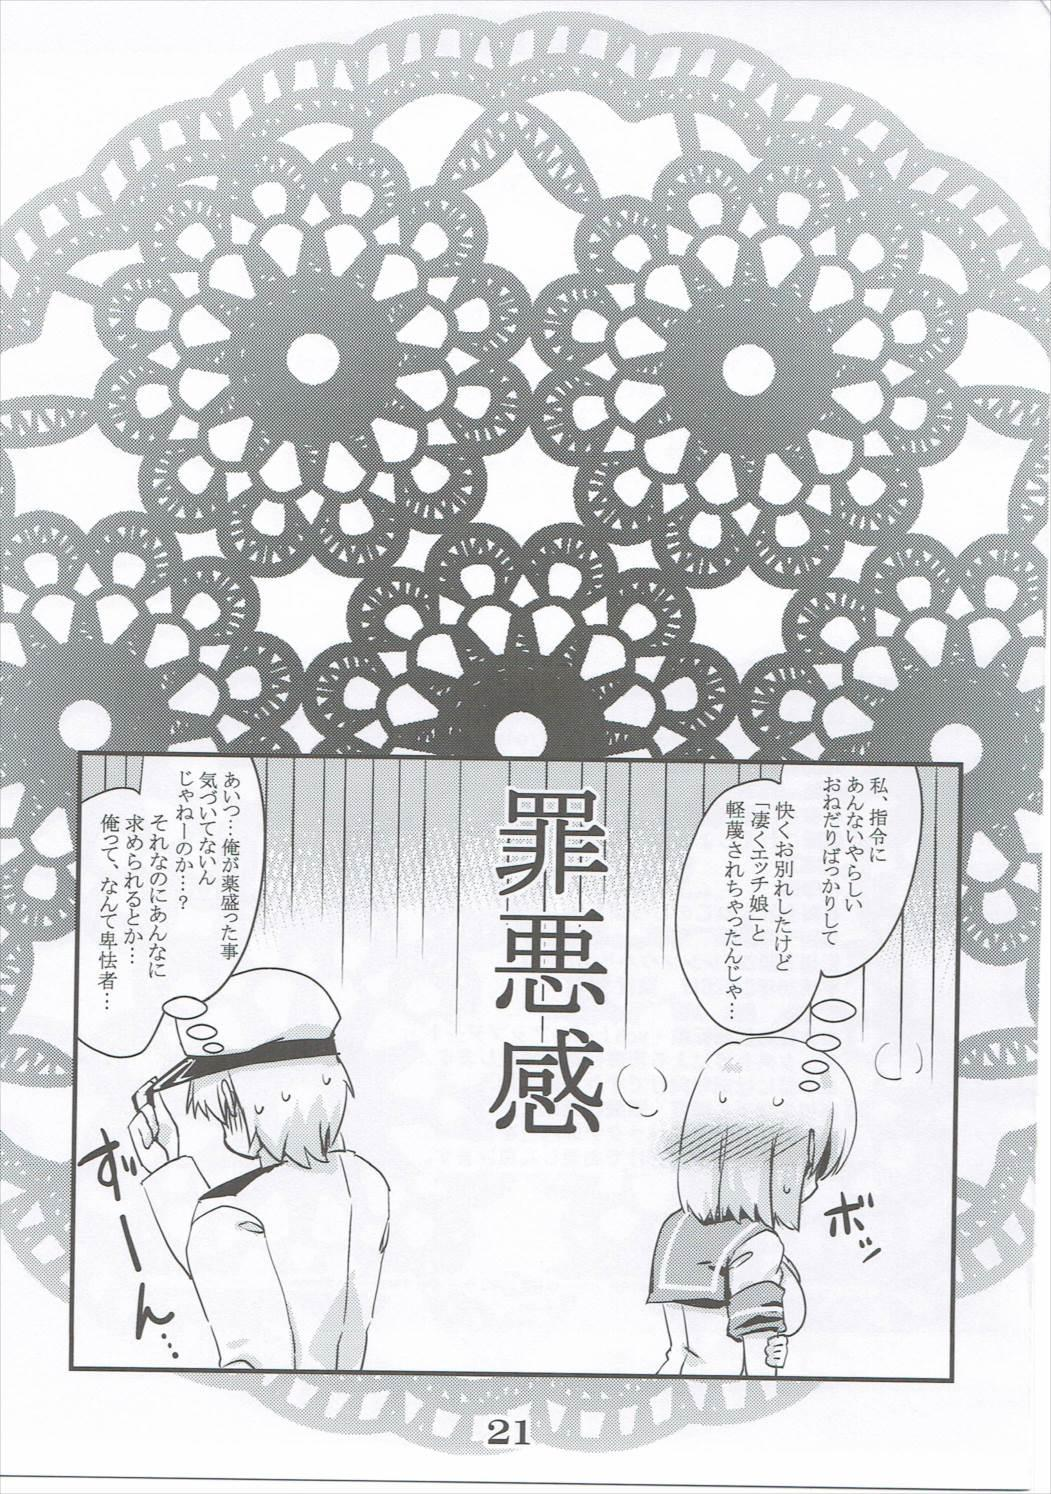 Rensou Harugatari 20 19